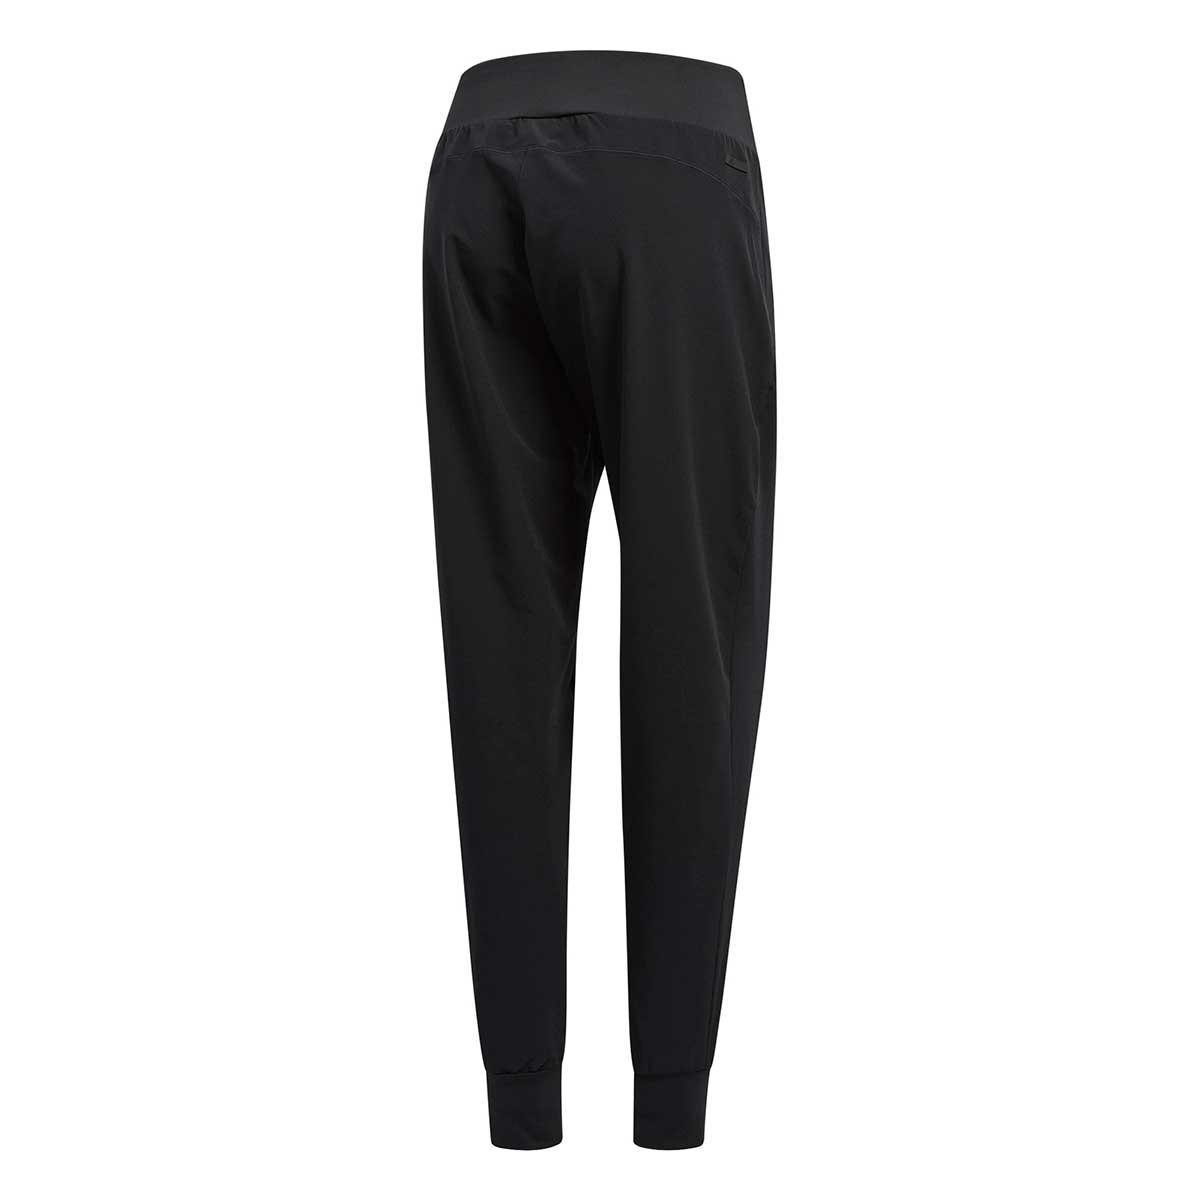 Adidas Women's Beyond 18 Black Pants